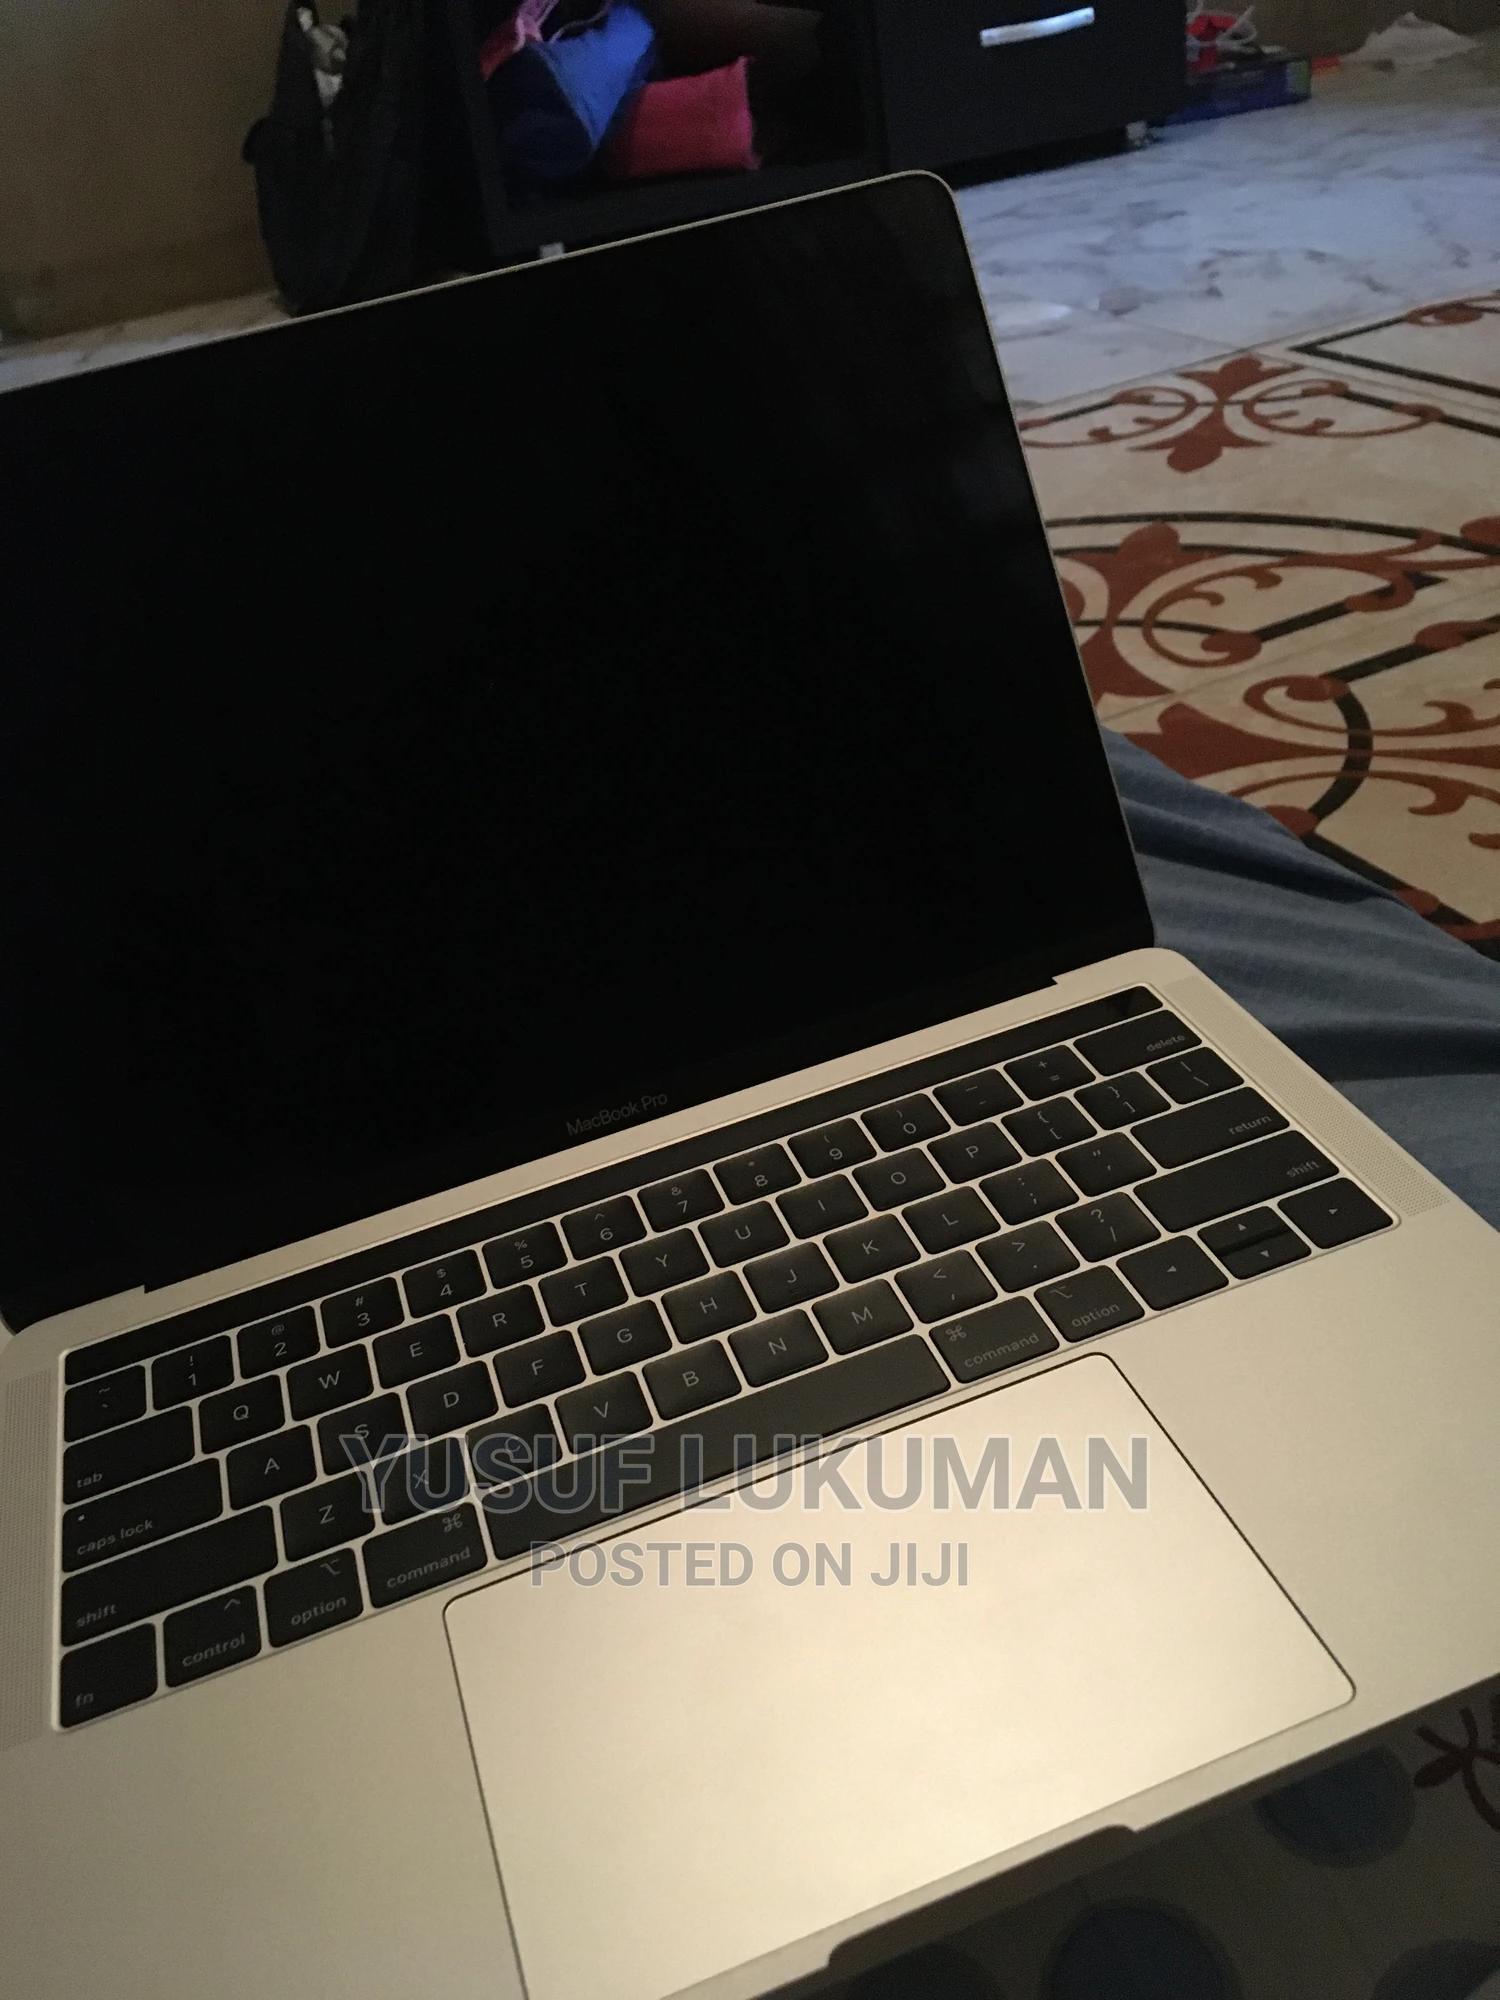 New Laptop Apple MacBook Pro 2019 8GB Intel Core I5 SSD 256GB | Laptops & Computers for sale in Ilorin West, Kwara State, Nigeria